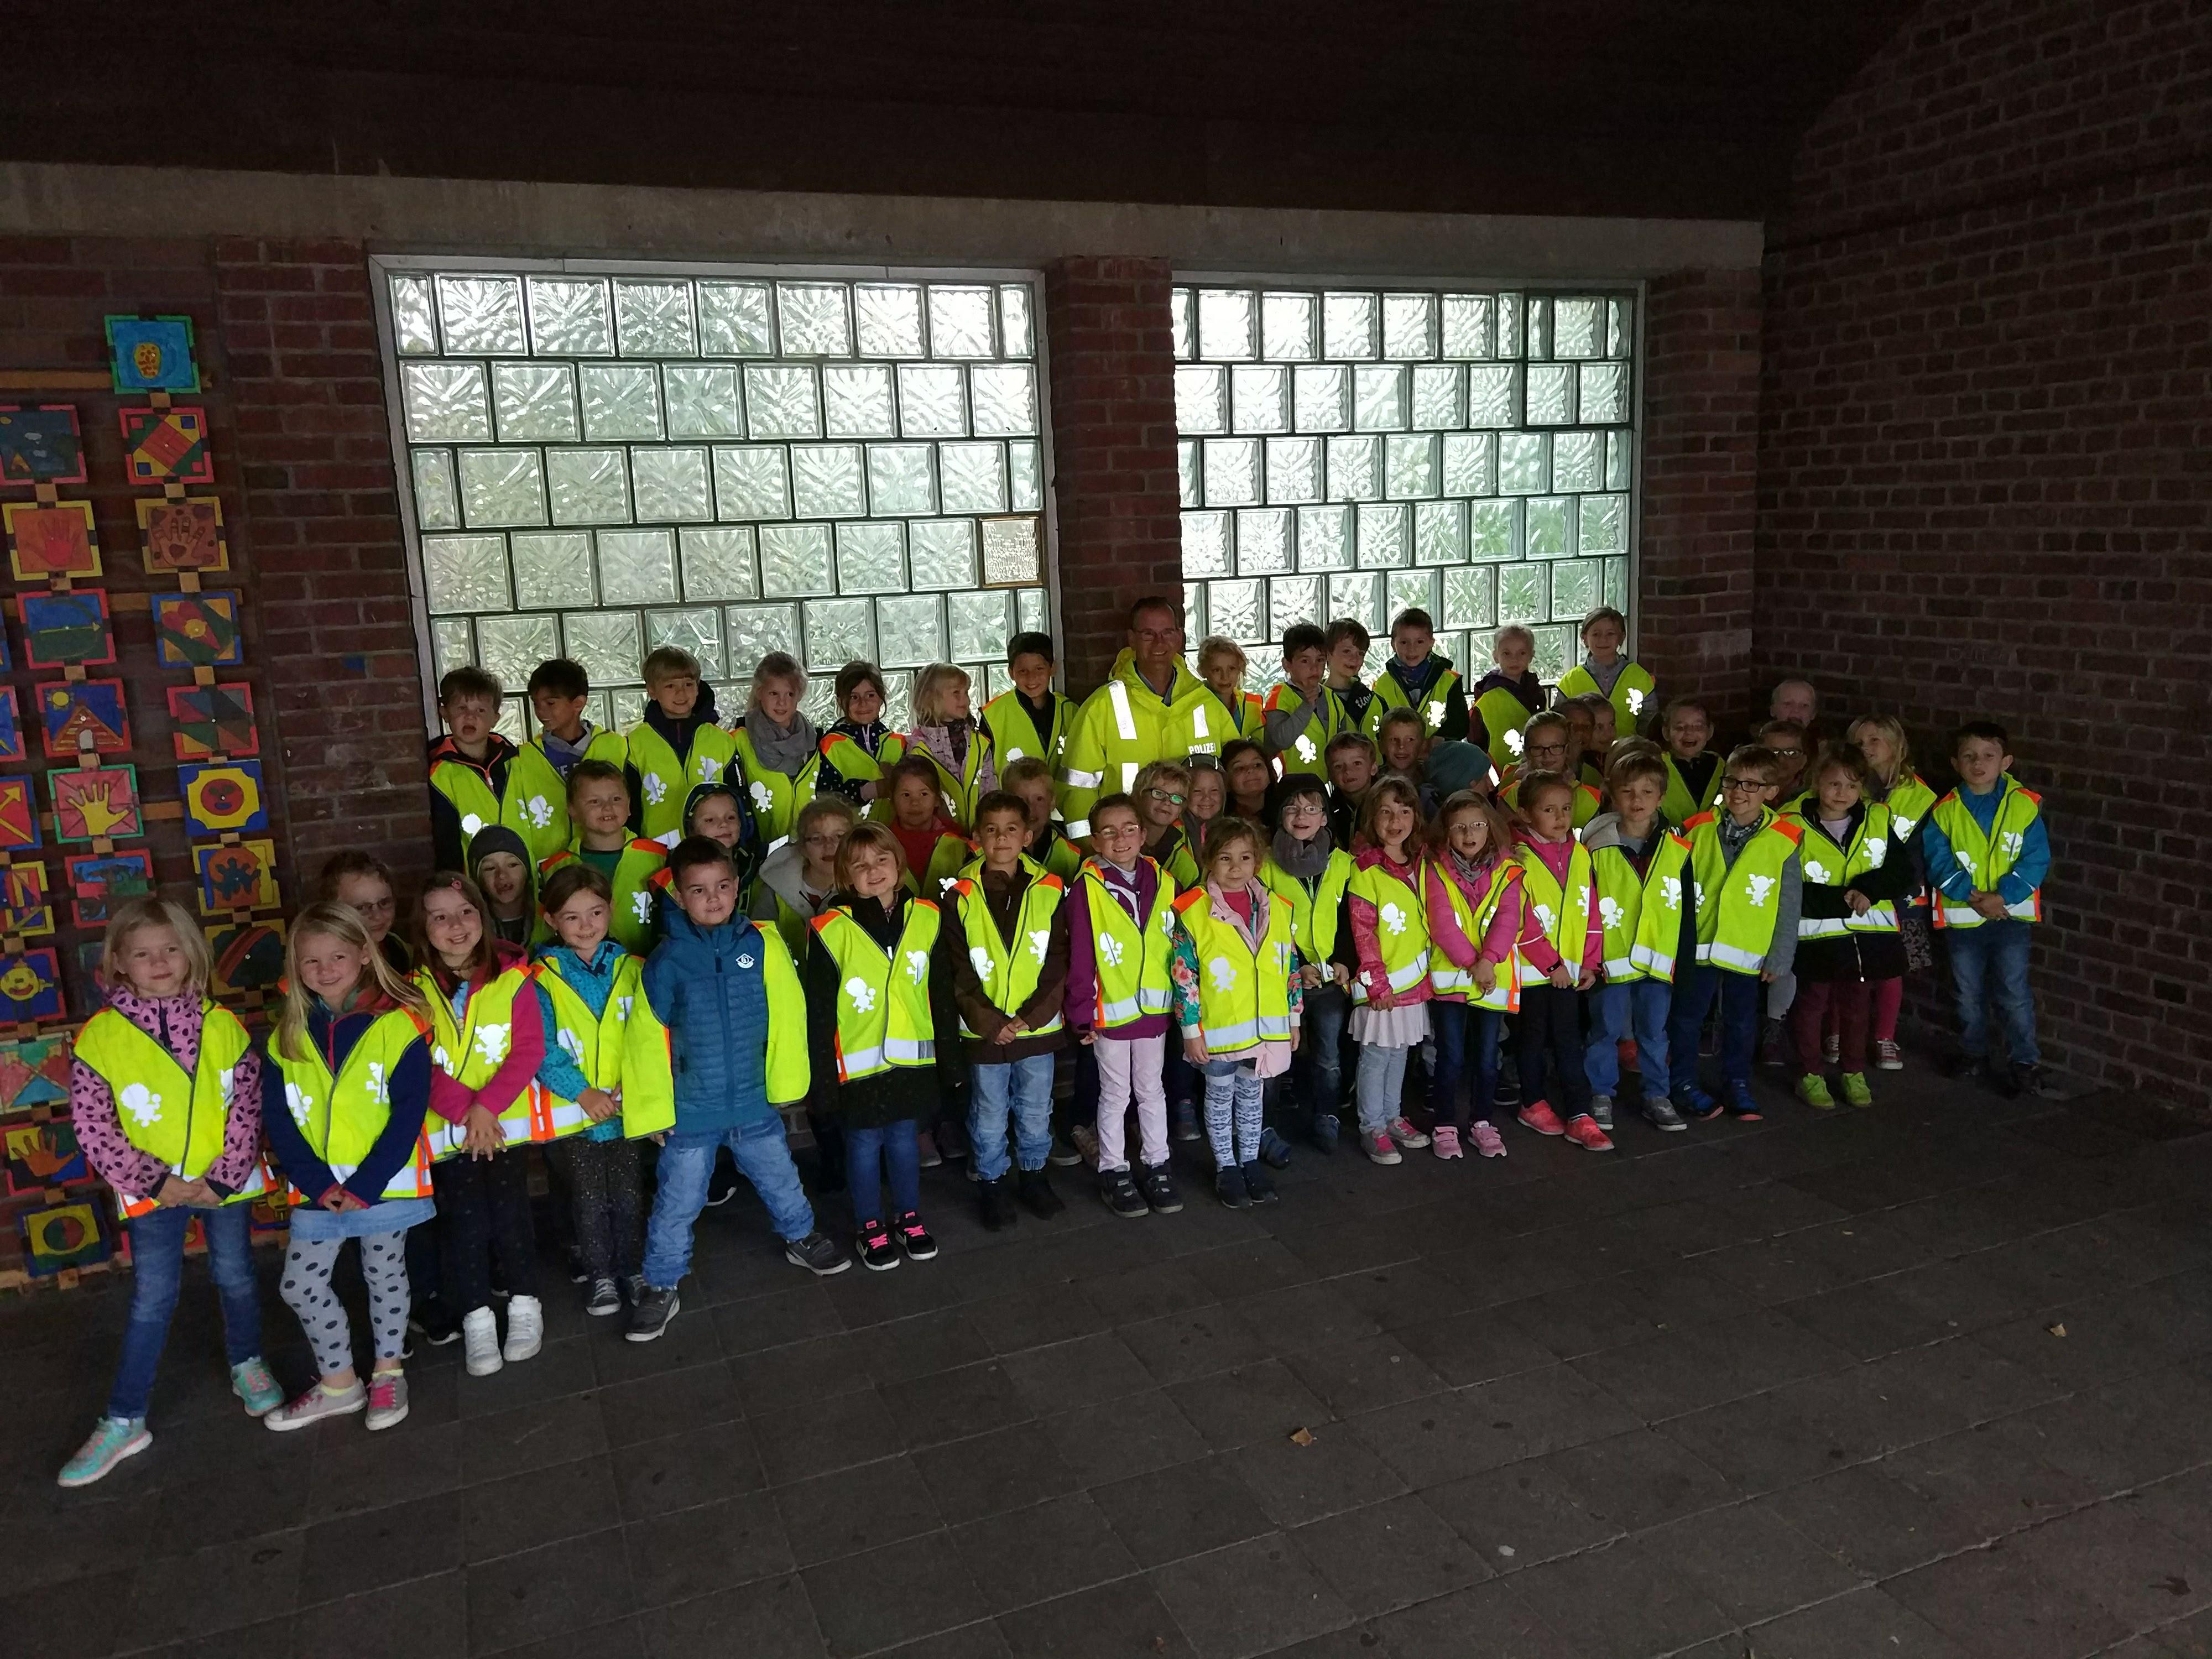 Grundschüler mit Warnwesten - KGS Birgelen